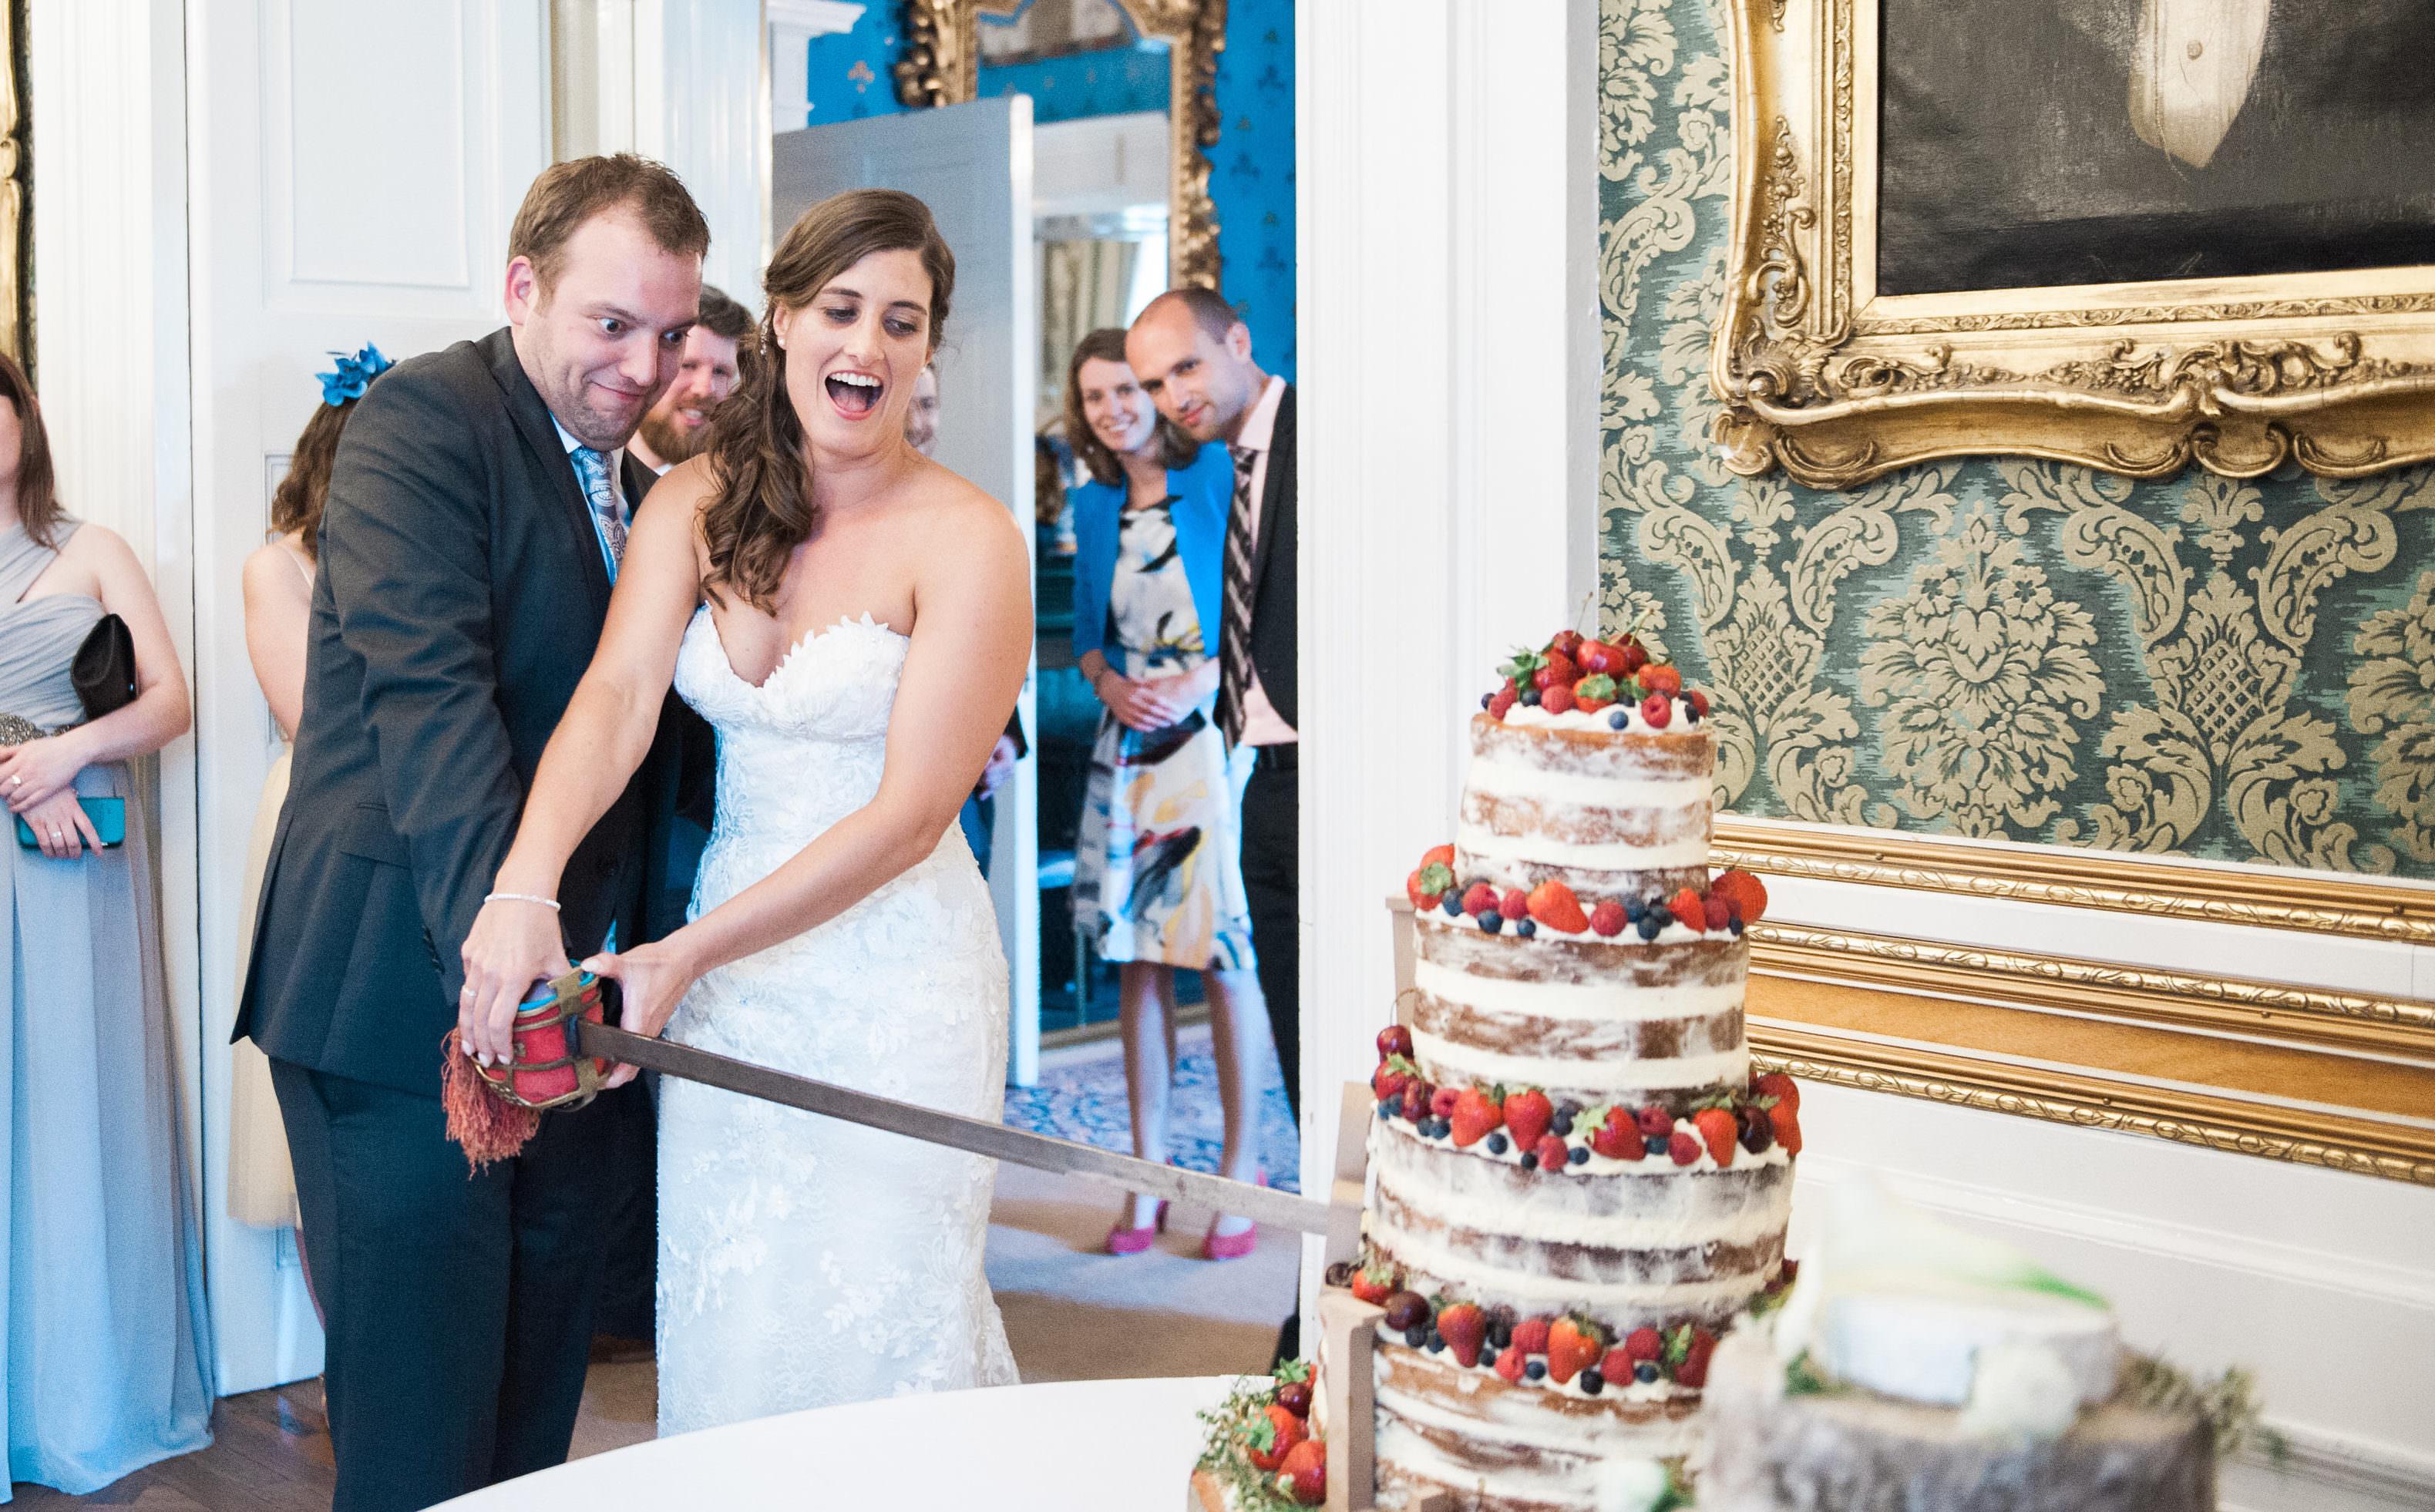 Scotland Destination Wedding Photographer at Drumtochty Castle